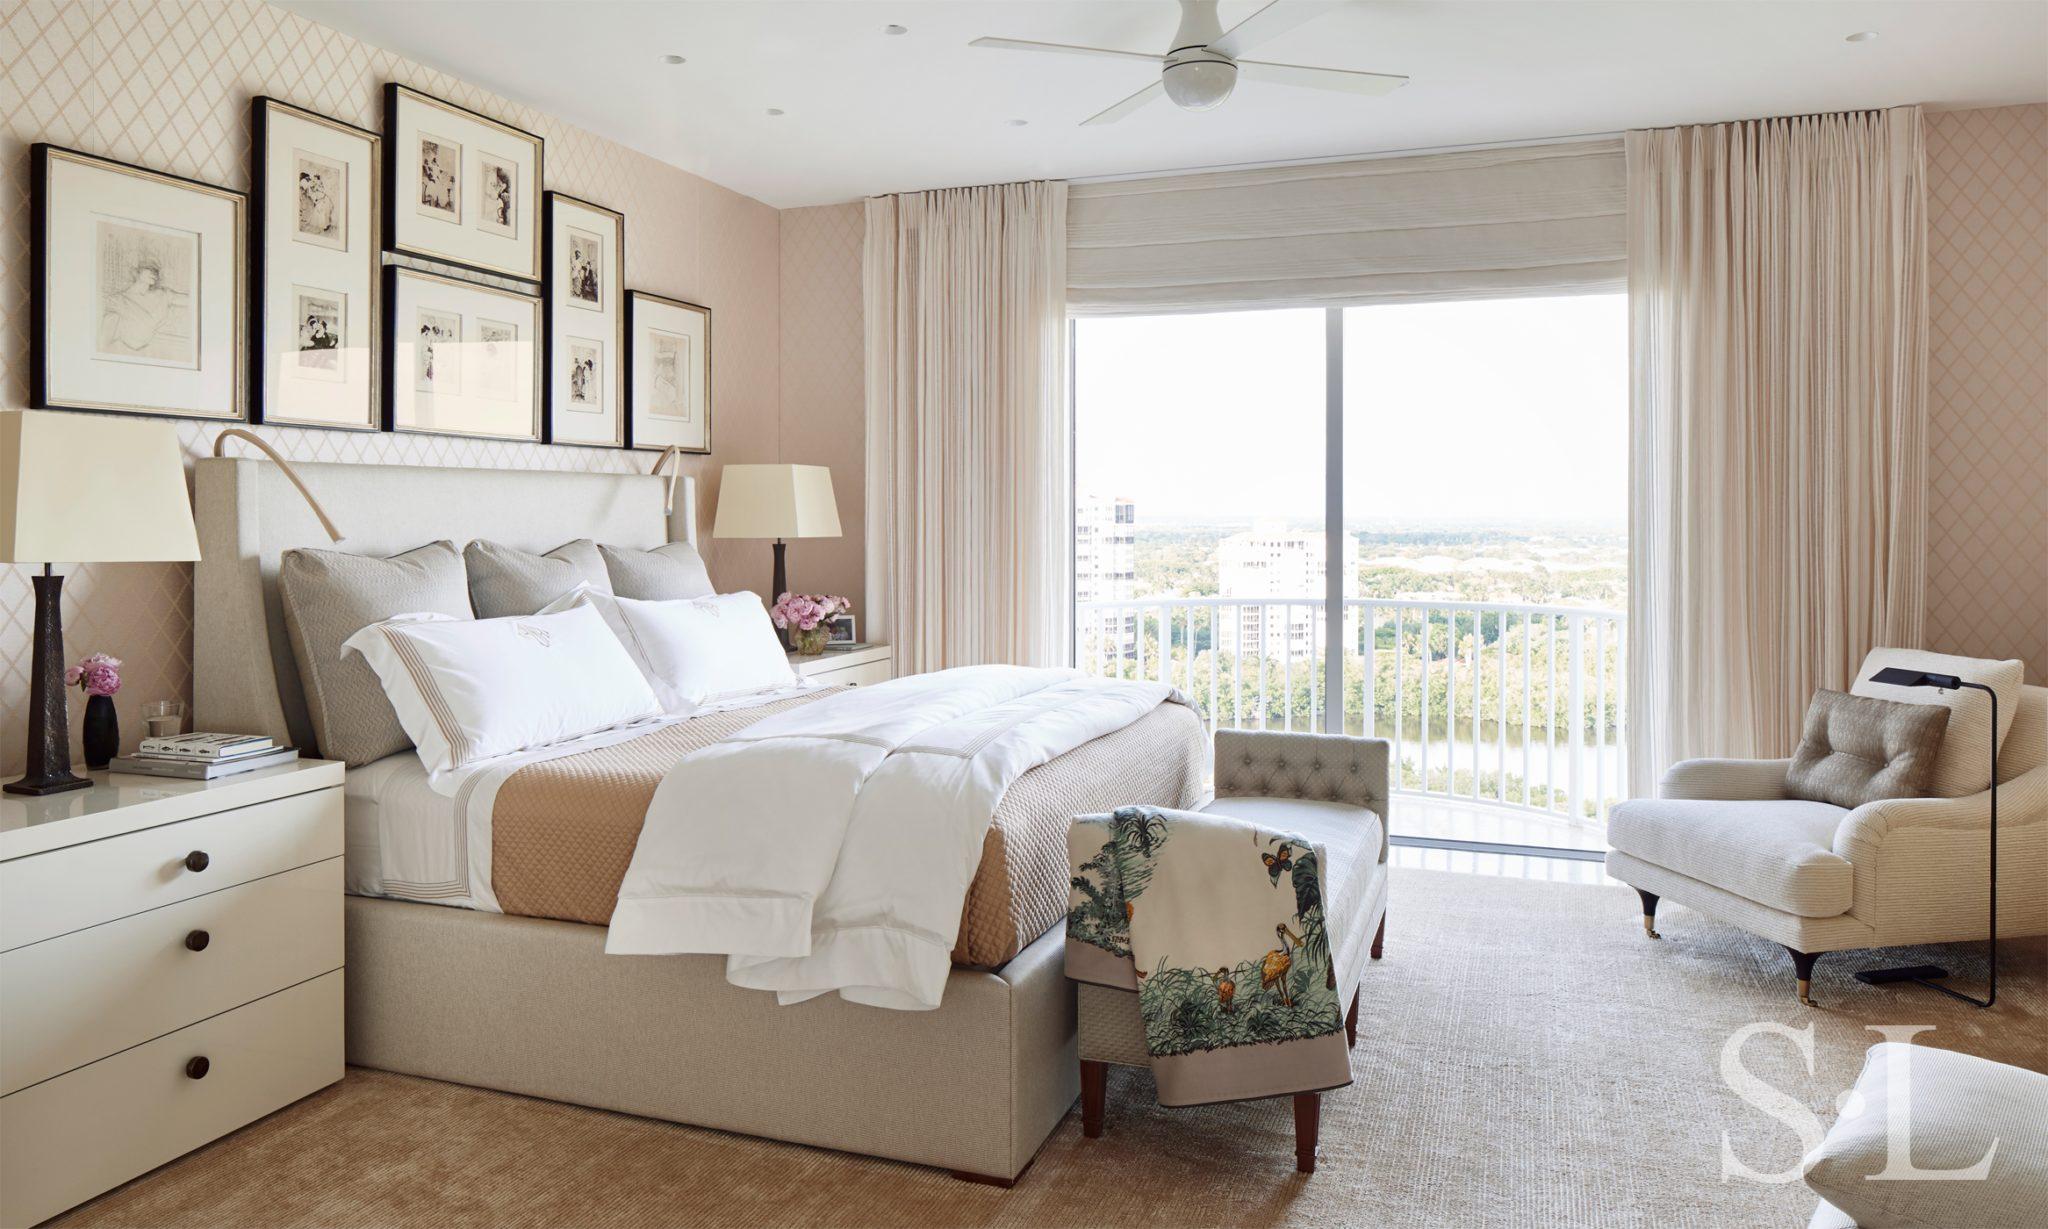 Gulf Coast penthouse by Suzanne Lovell Inc.